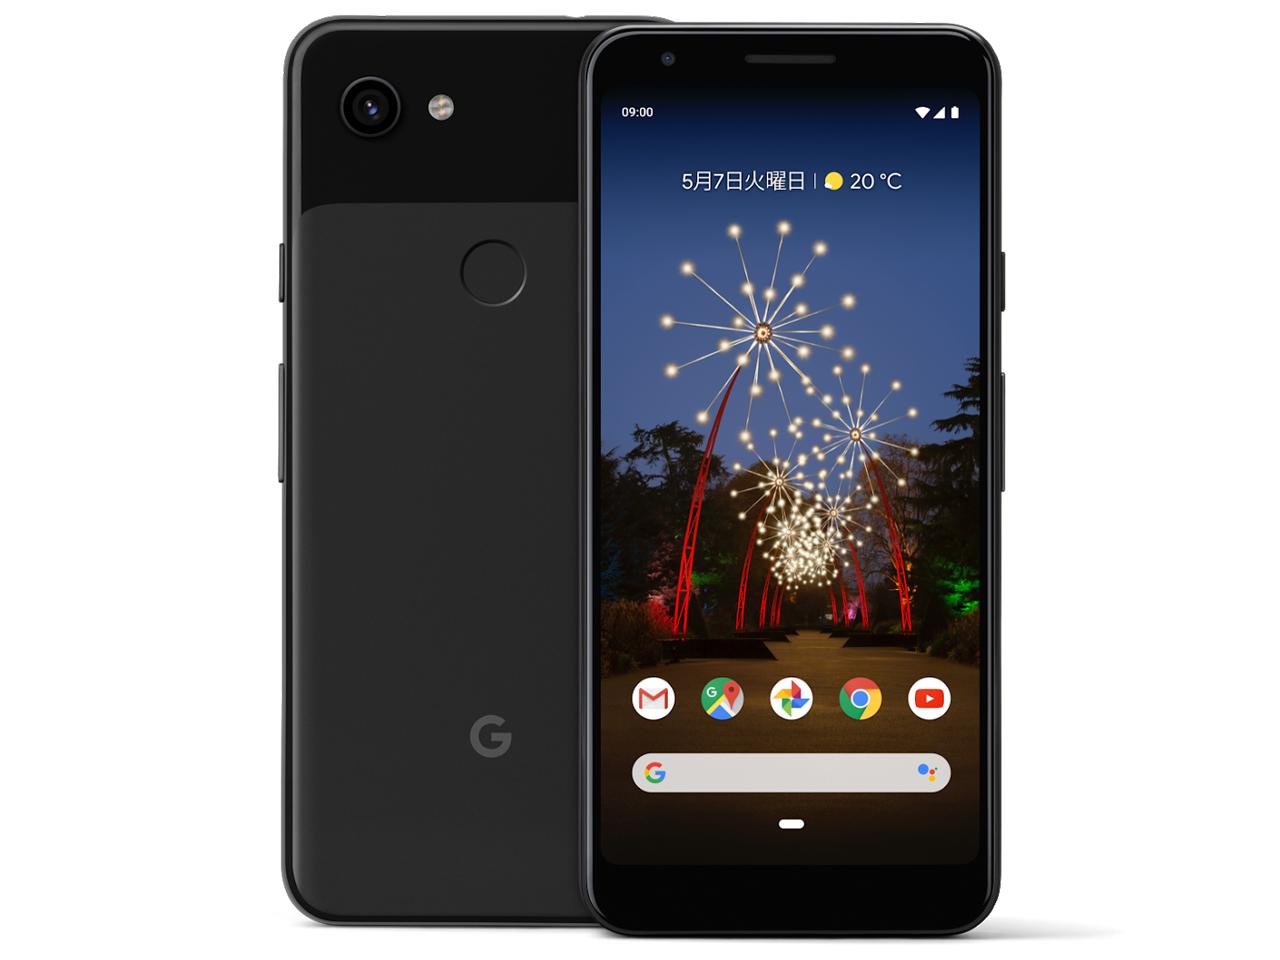 Google Pixel 3a SIMフリー [Just Black] の製品画像